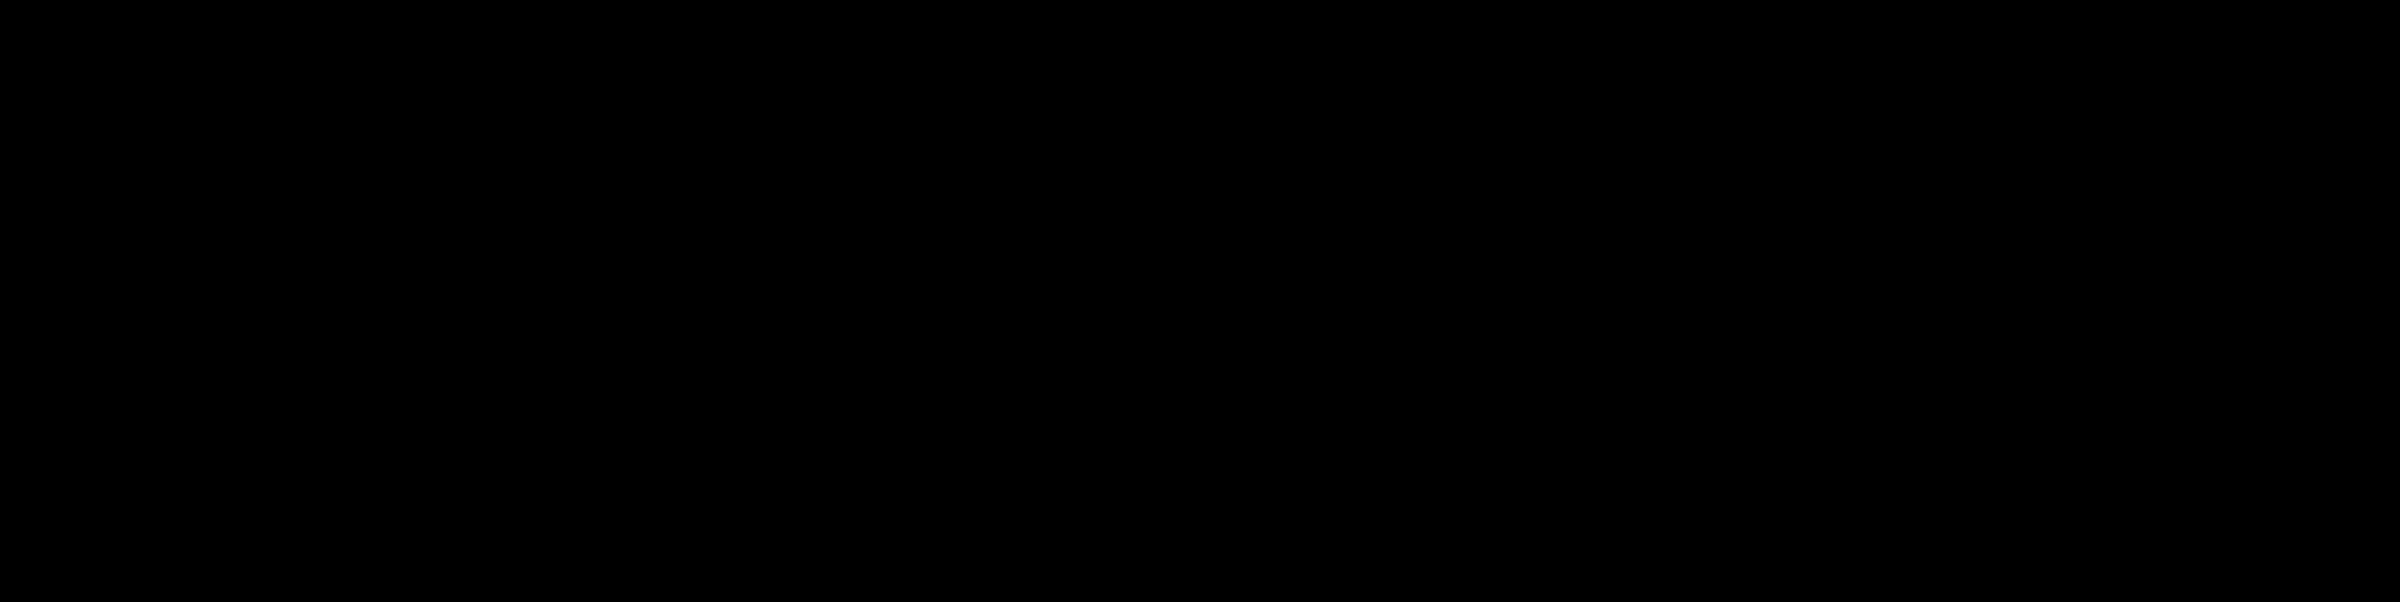 Scolopendra gigantea insect centipedes. Worm clipart centipede